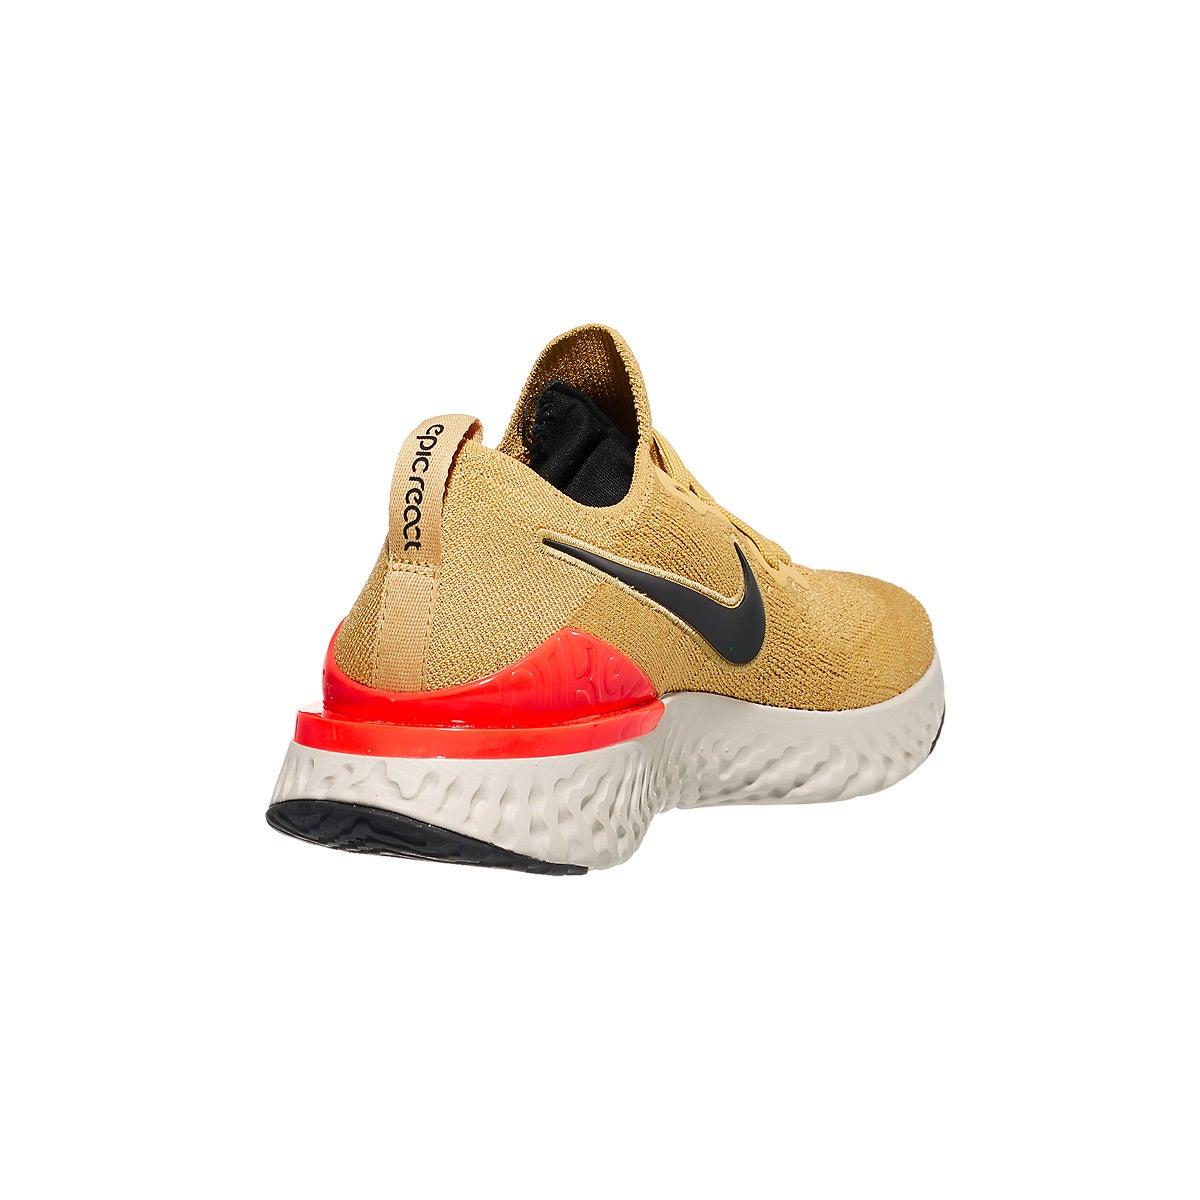 235f0f4e3dead4 Nike Epic React Flyknit 2 Men s Shoes Club Gold Black 360° View ...